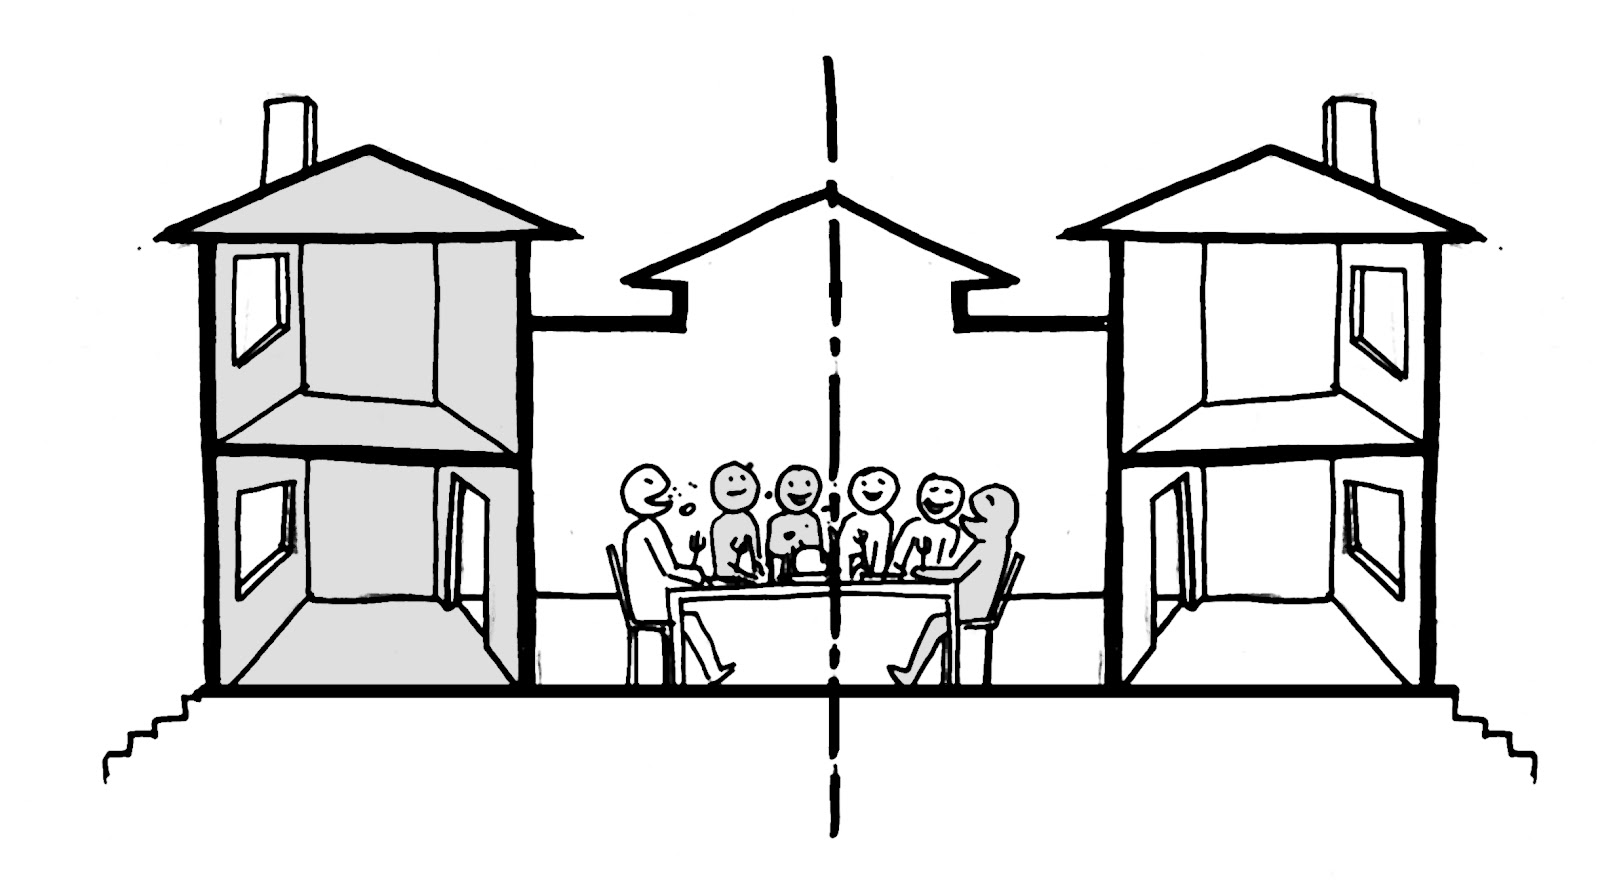 Kyle Doggett S Architecture Blog Project Progress